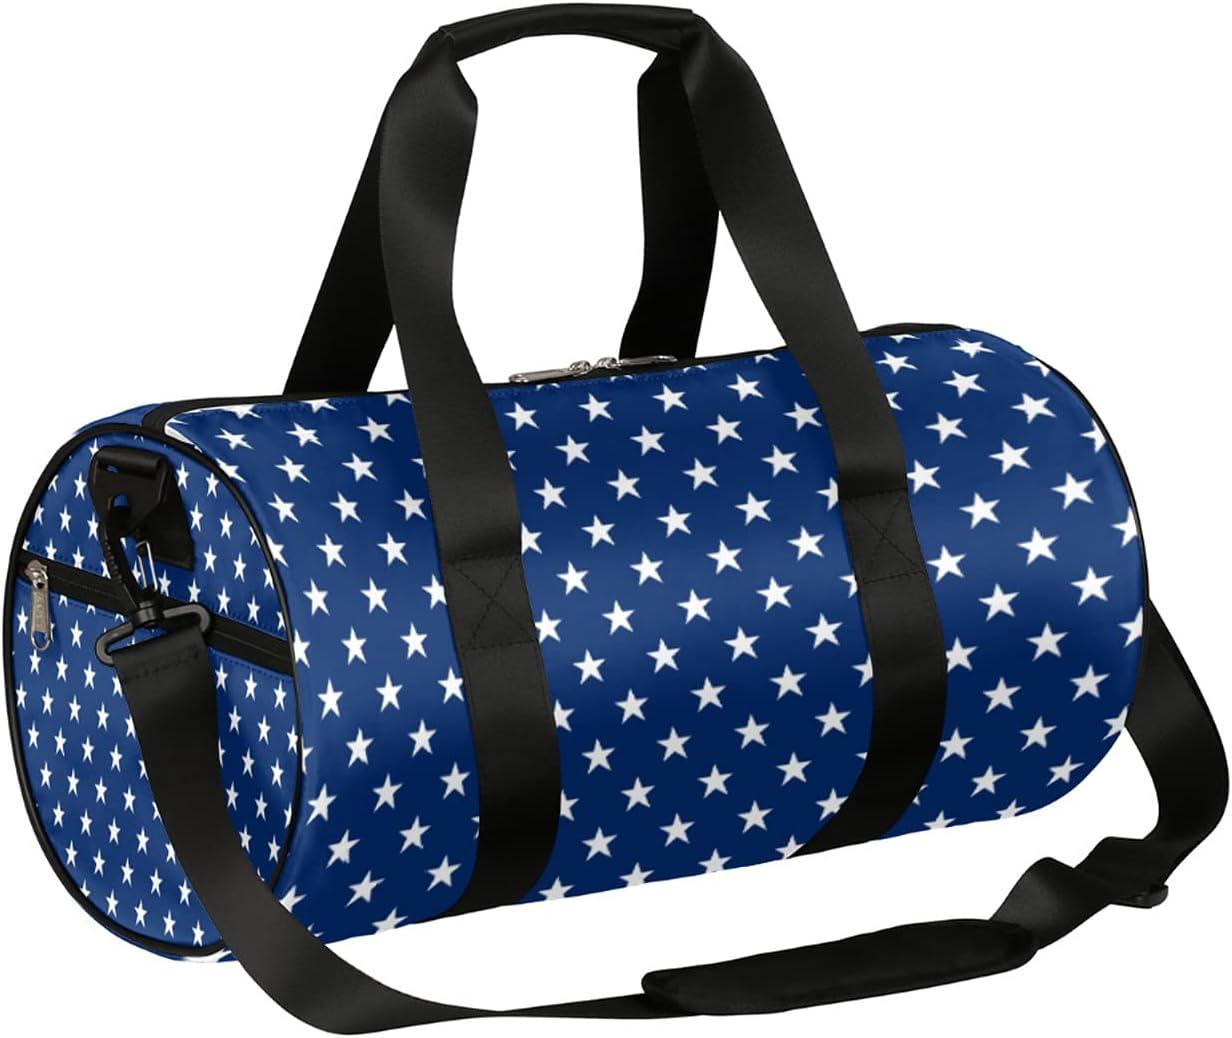 Sport Gym Bag Blue Star Fol Albuquerque Mall Duffel lightweight Portland Mall Pattern Small